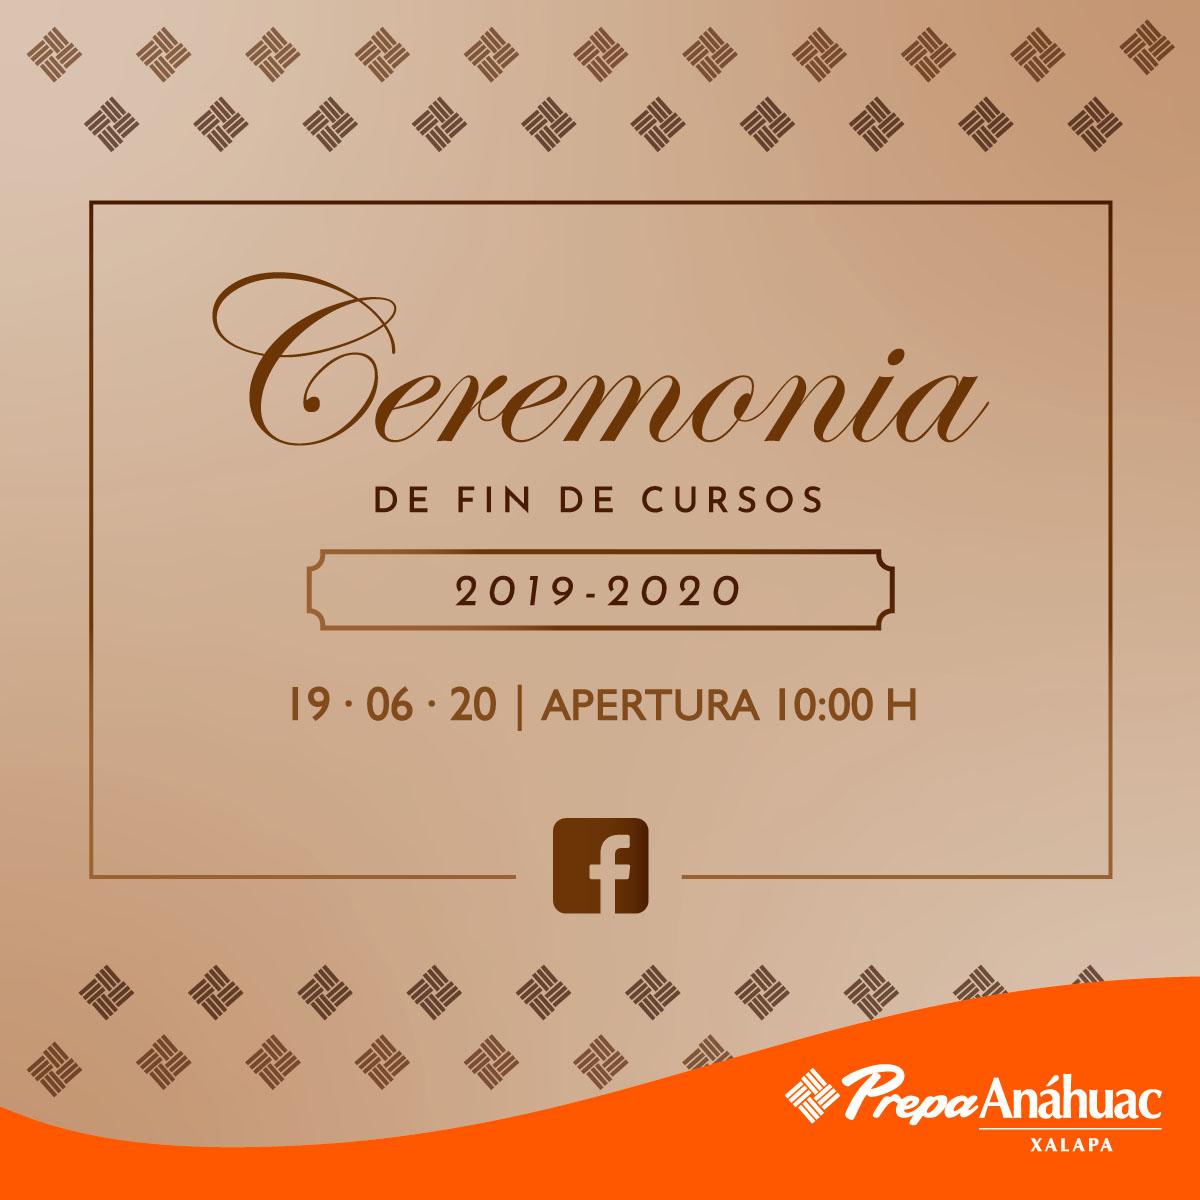 Ceremonia de Fin de Cursos 2019-2020